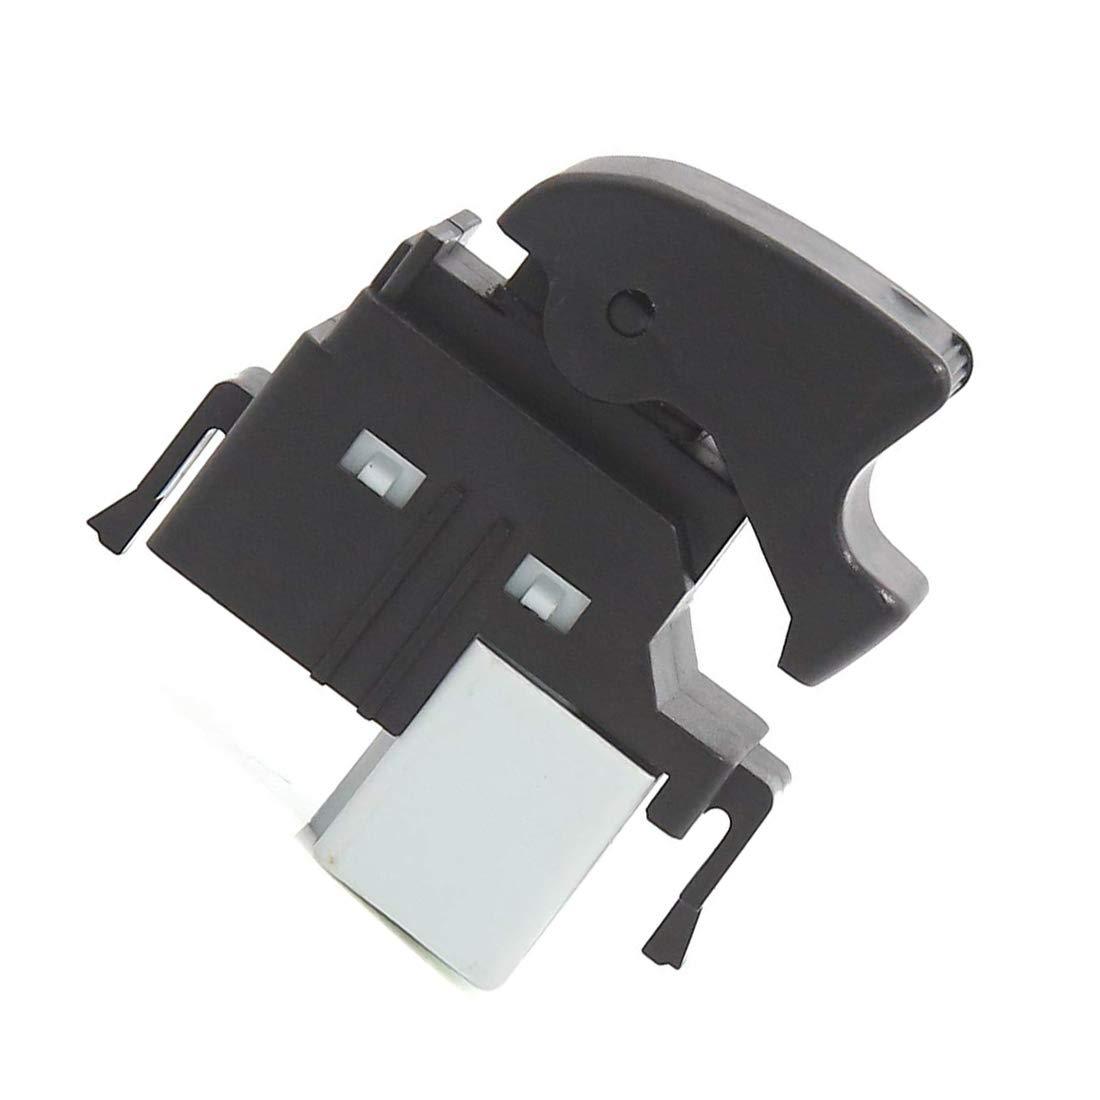 Autoly 8481012080 Front Passenger Side Rear Door Power Window Master Switch